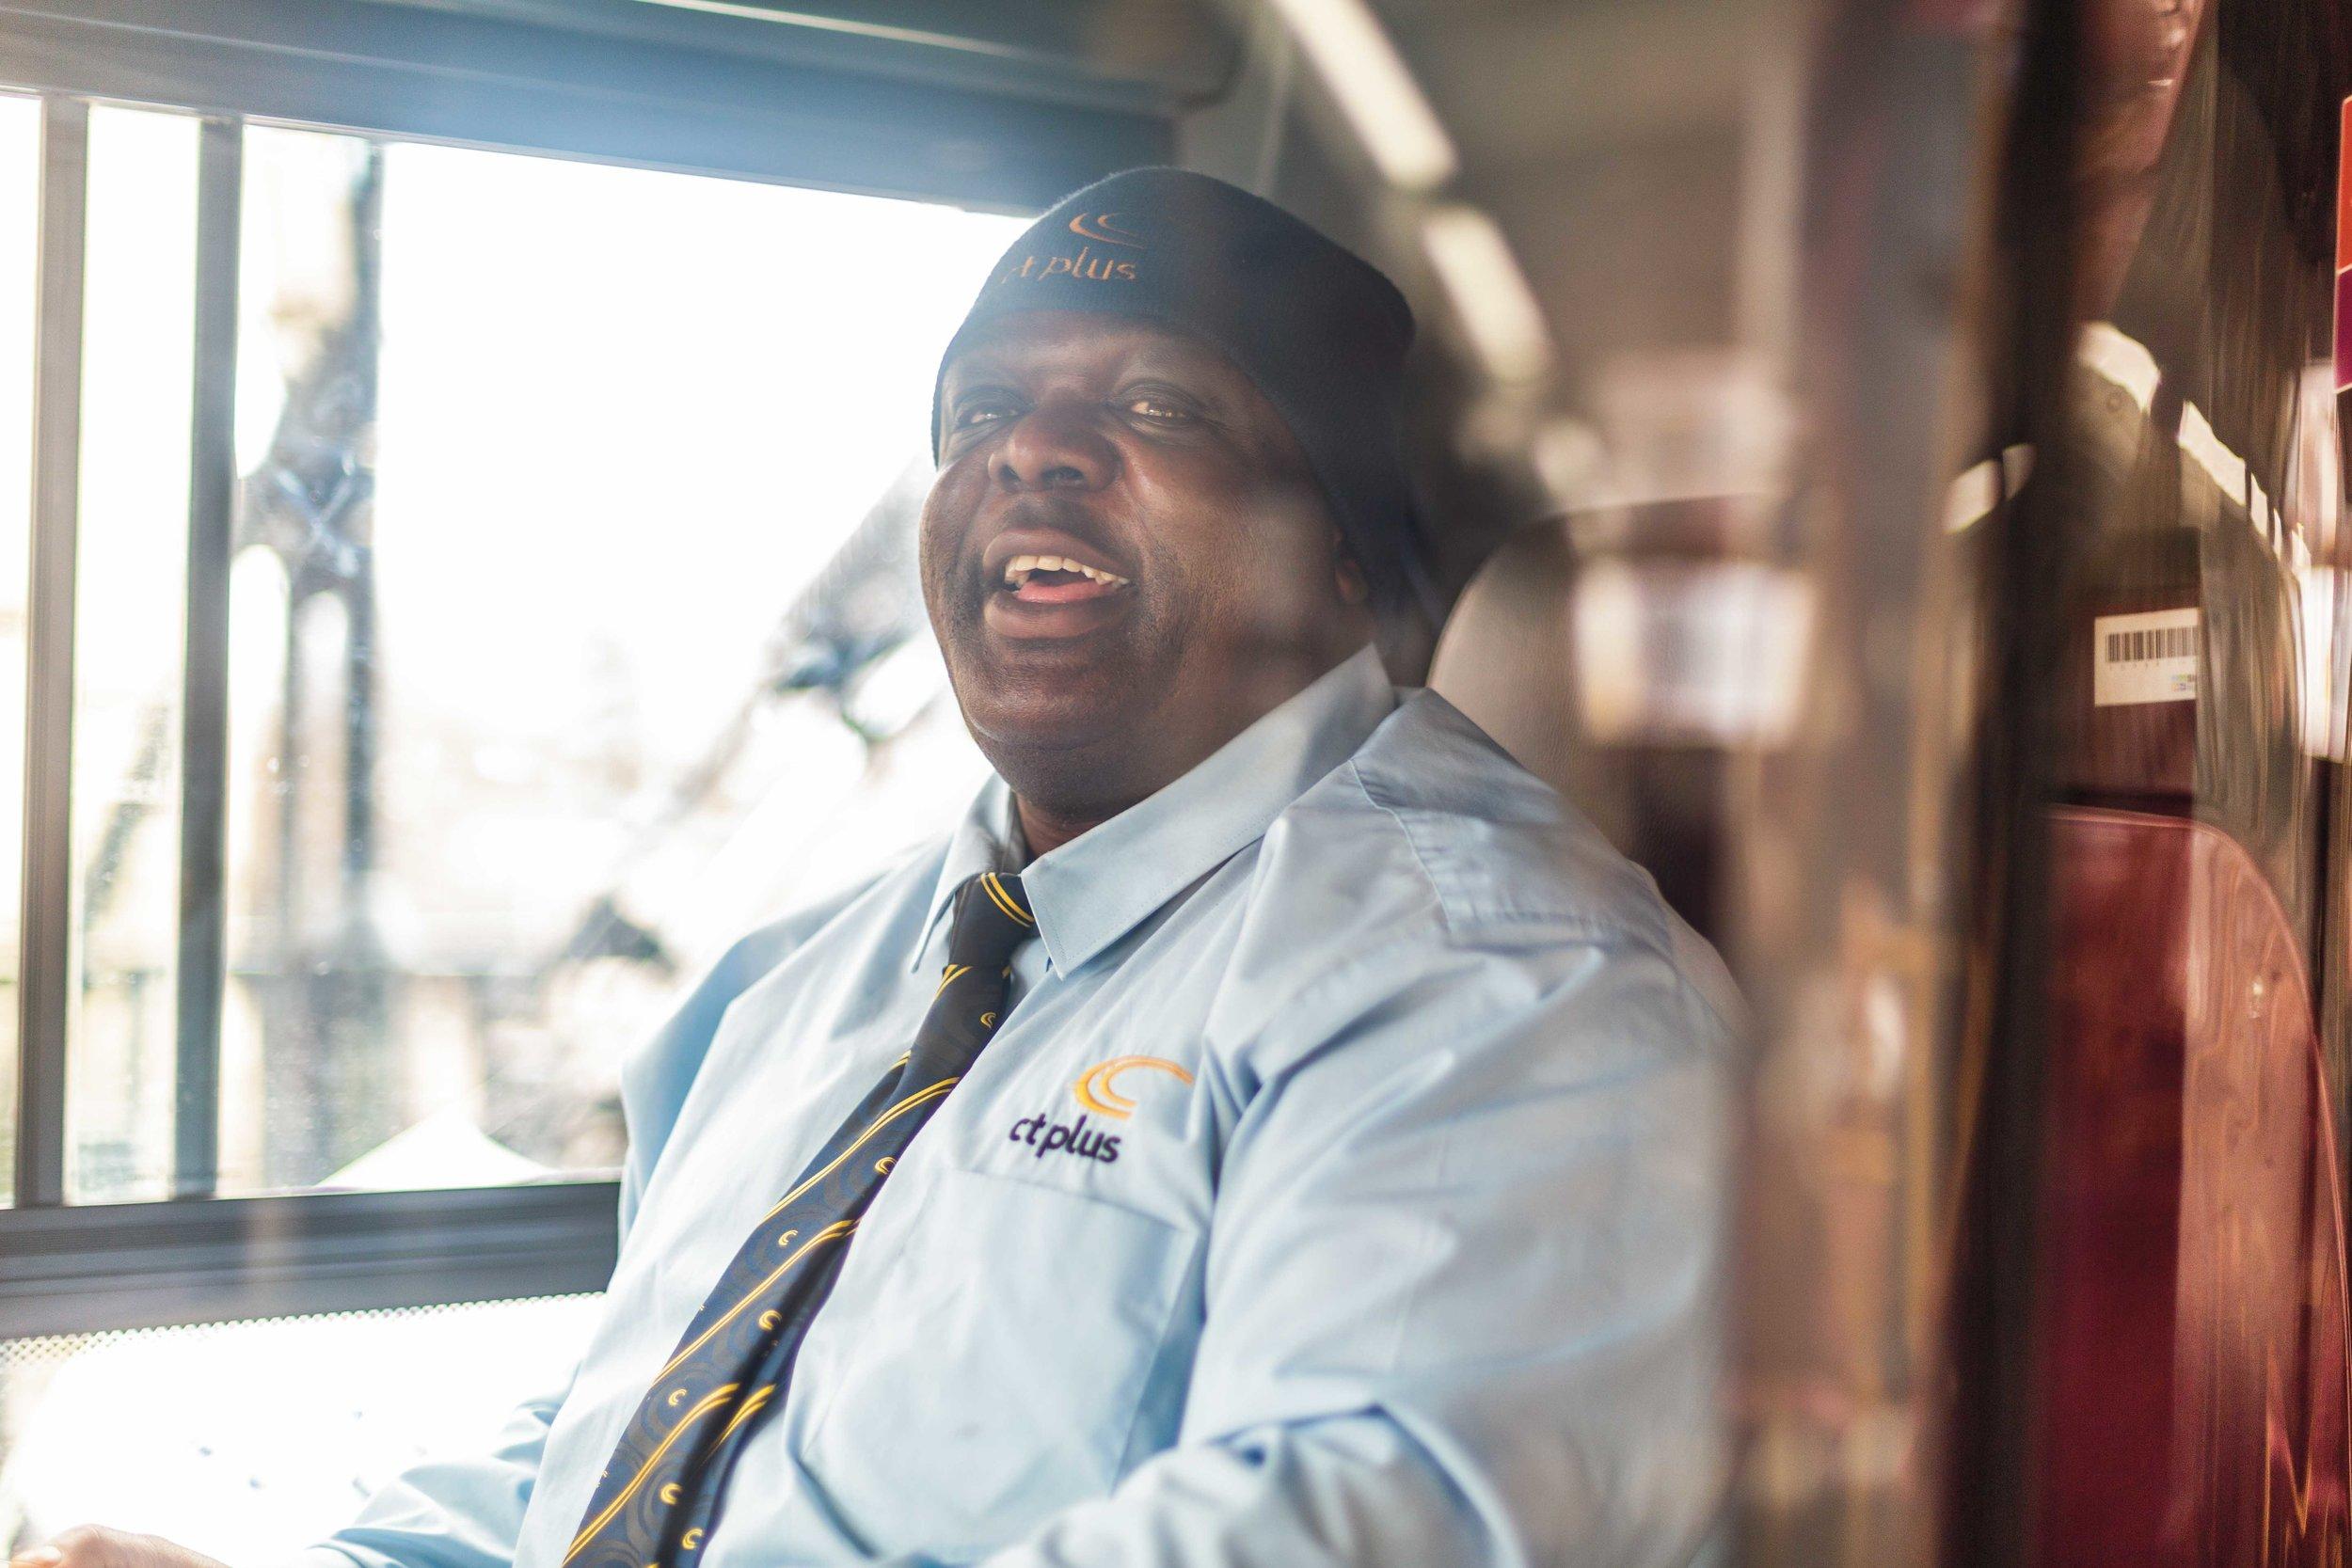 Patrick Lawson, Islington's happiest bus driver